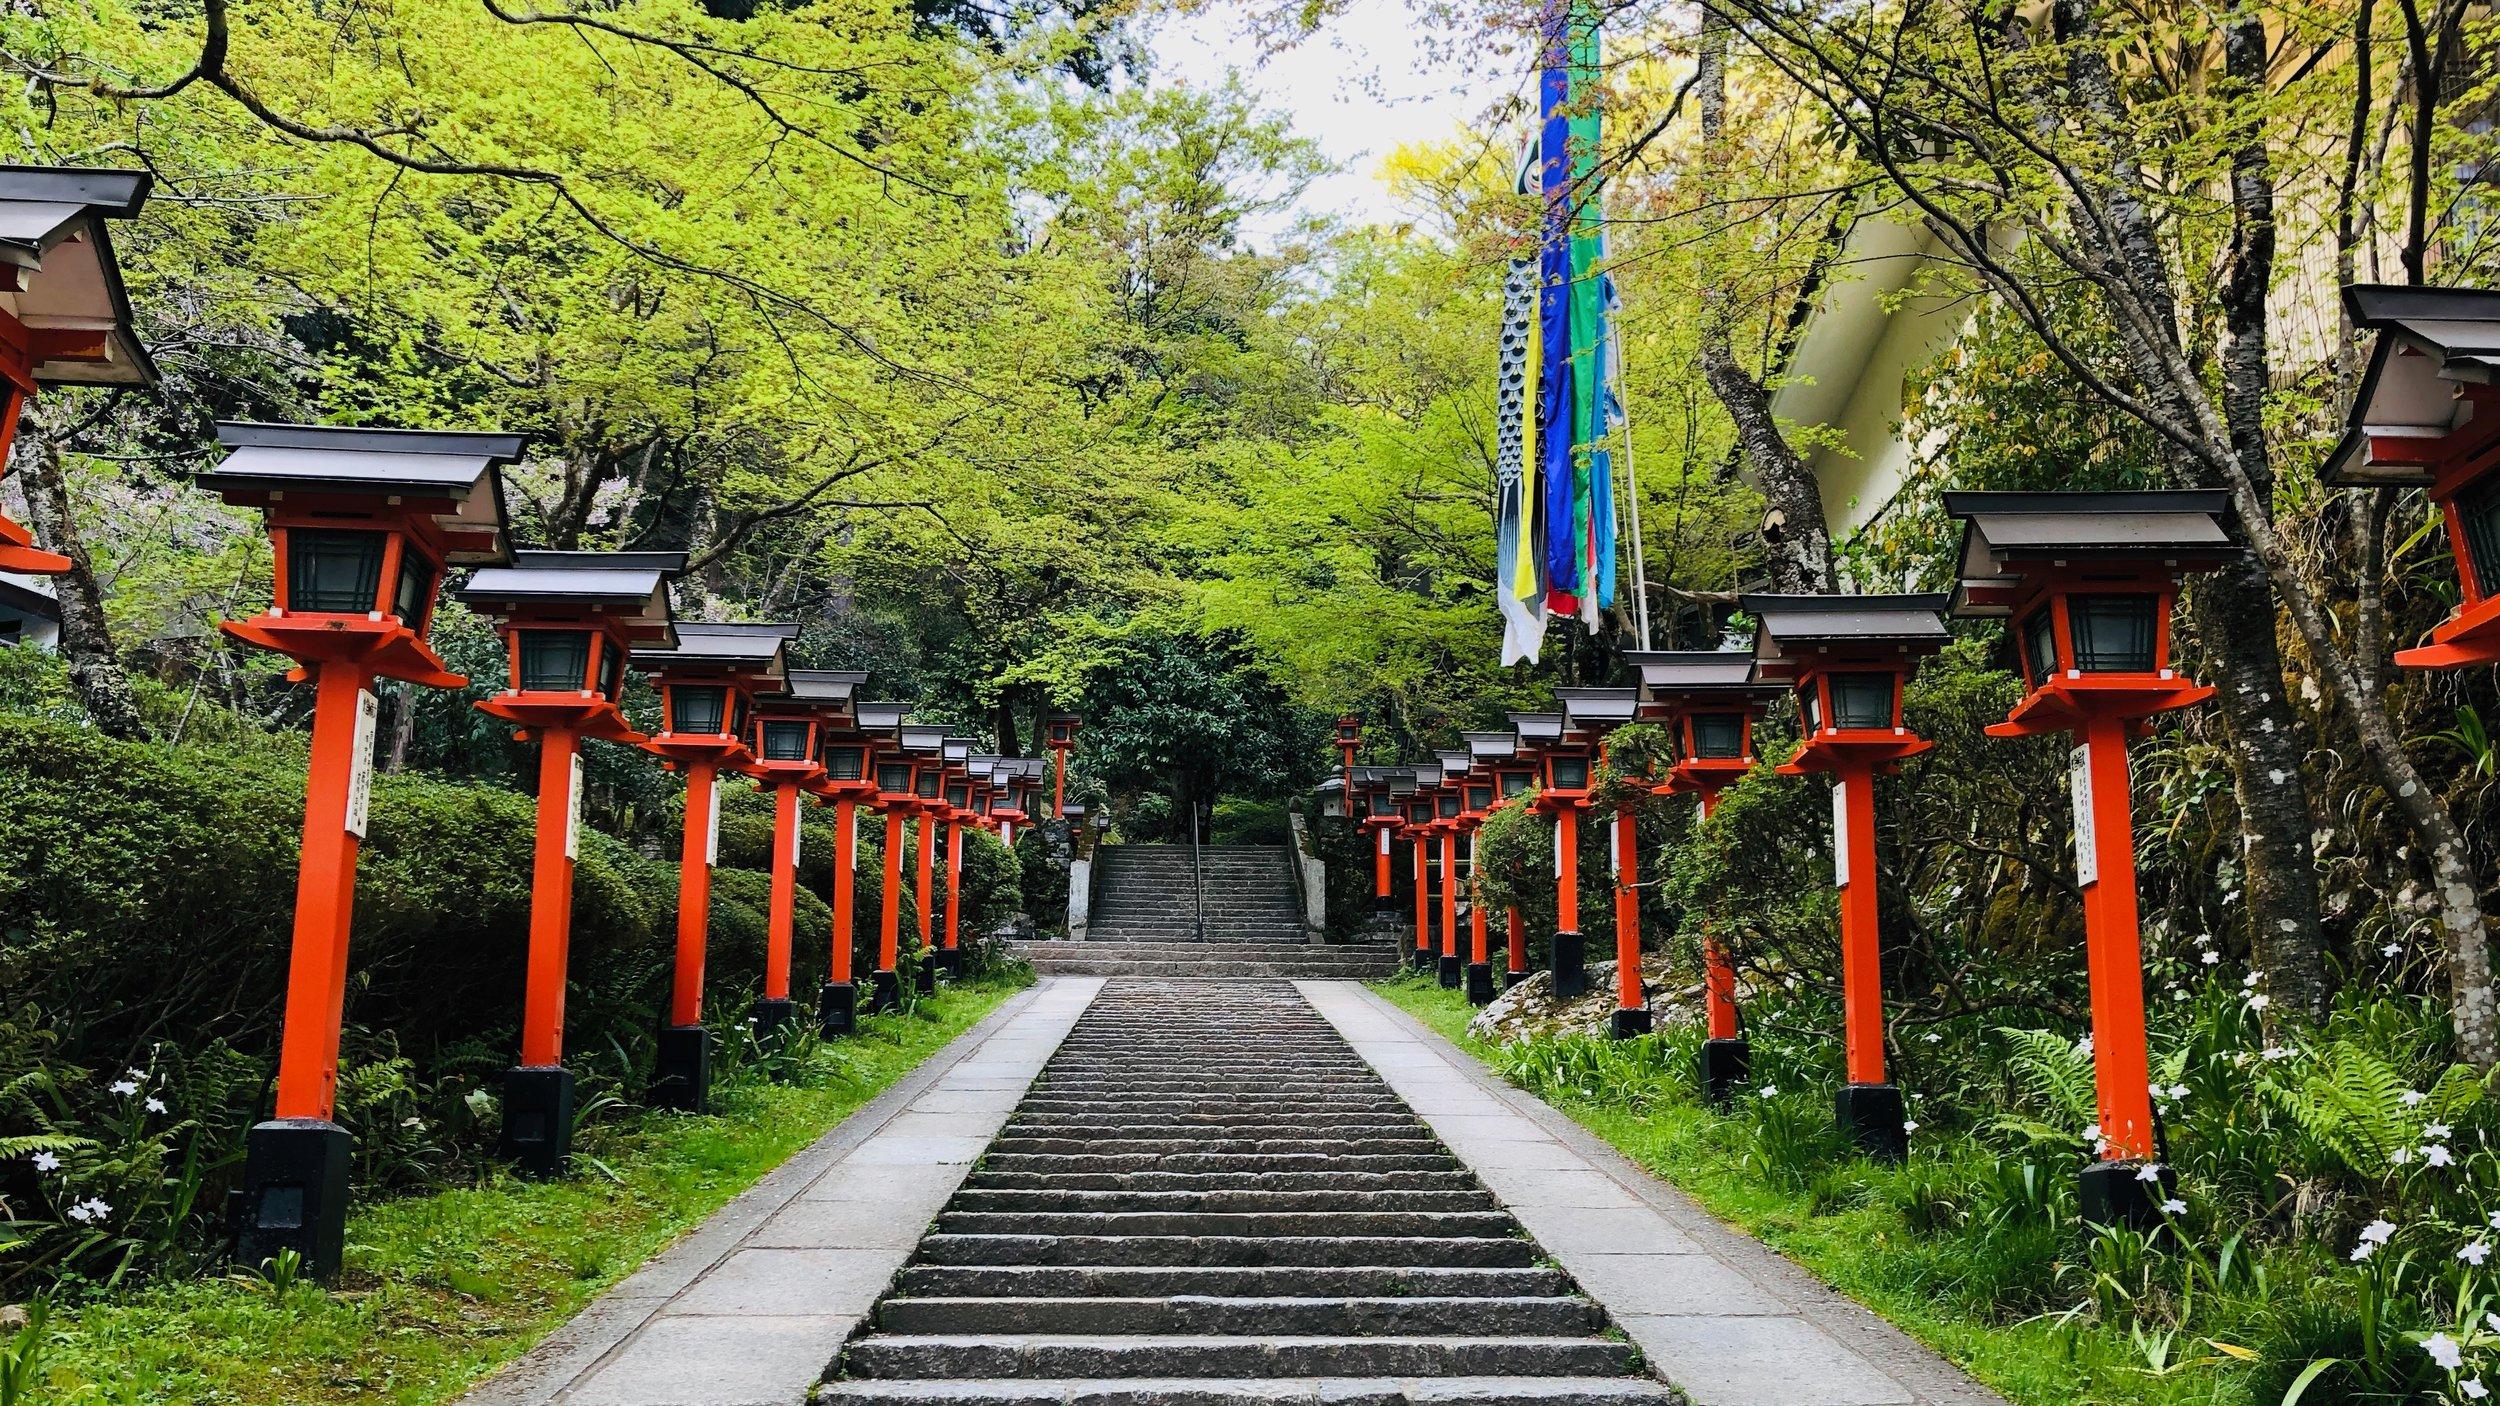 Stairs leading up to Mount Kurama.